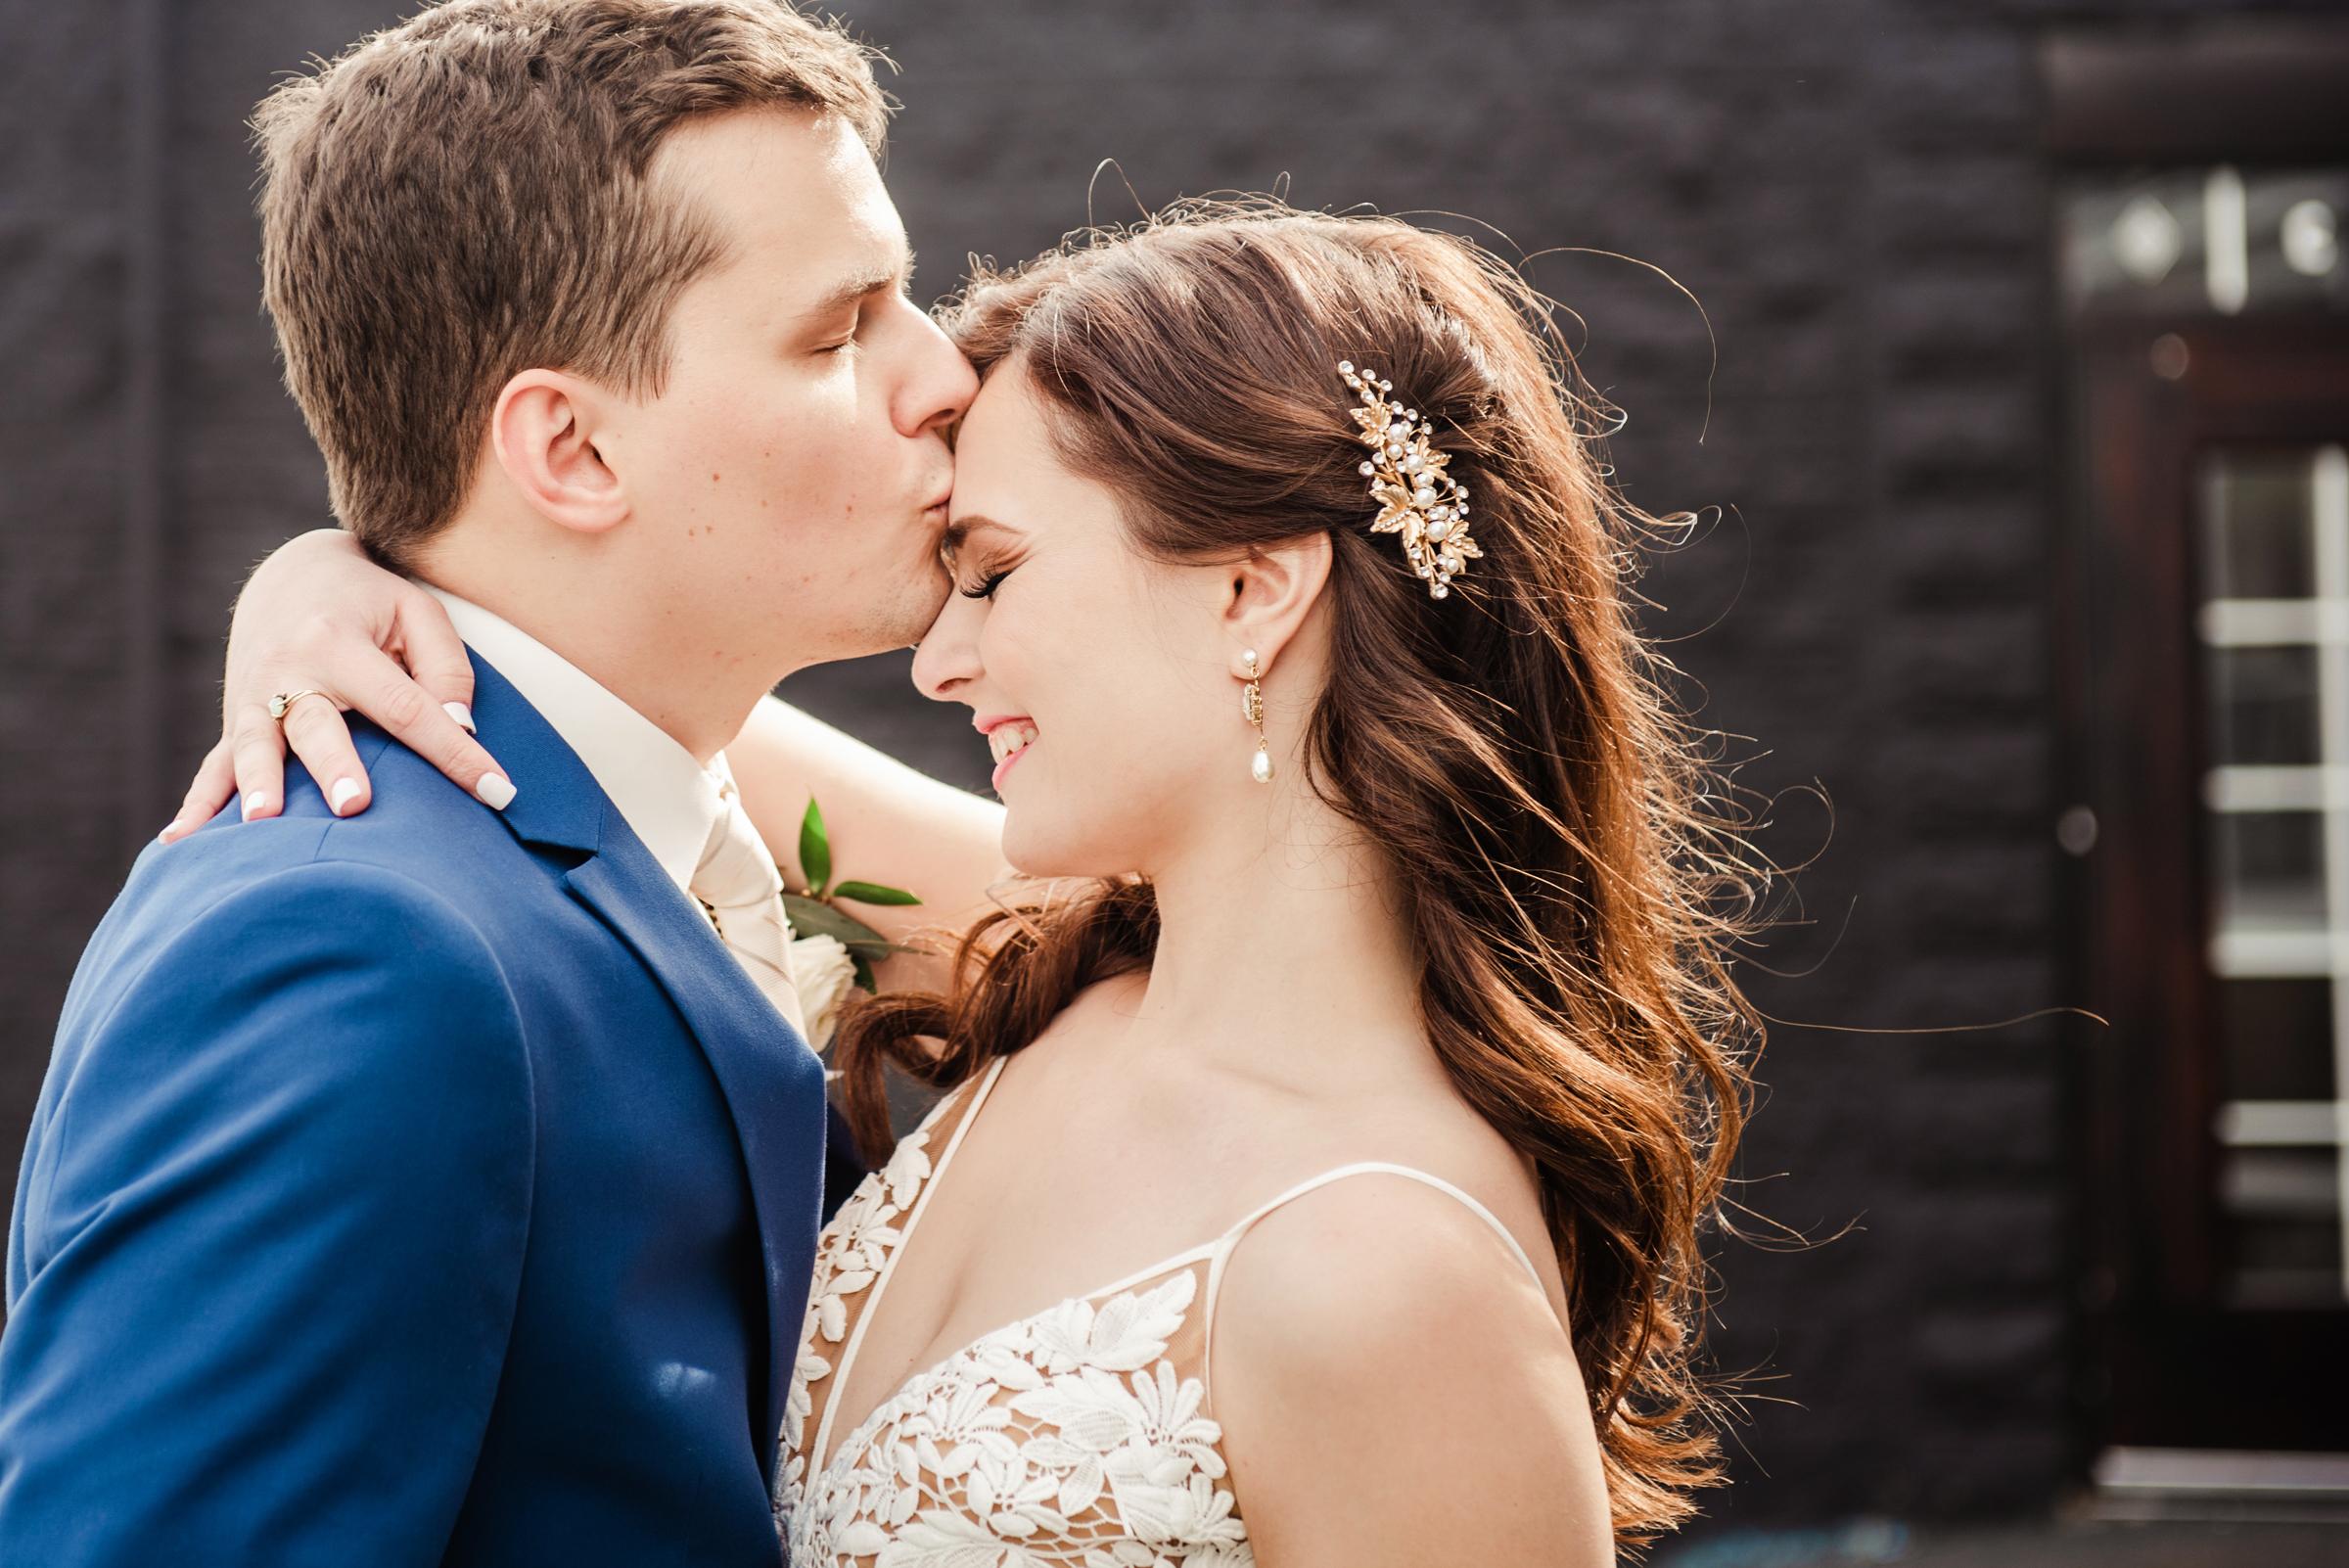 The_Arbor_LoftRochester_Wedding_JILL_STUDIO_Rochester_NY_Photographer_160535.jpg